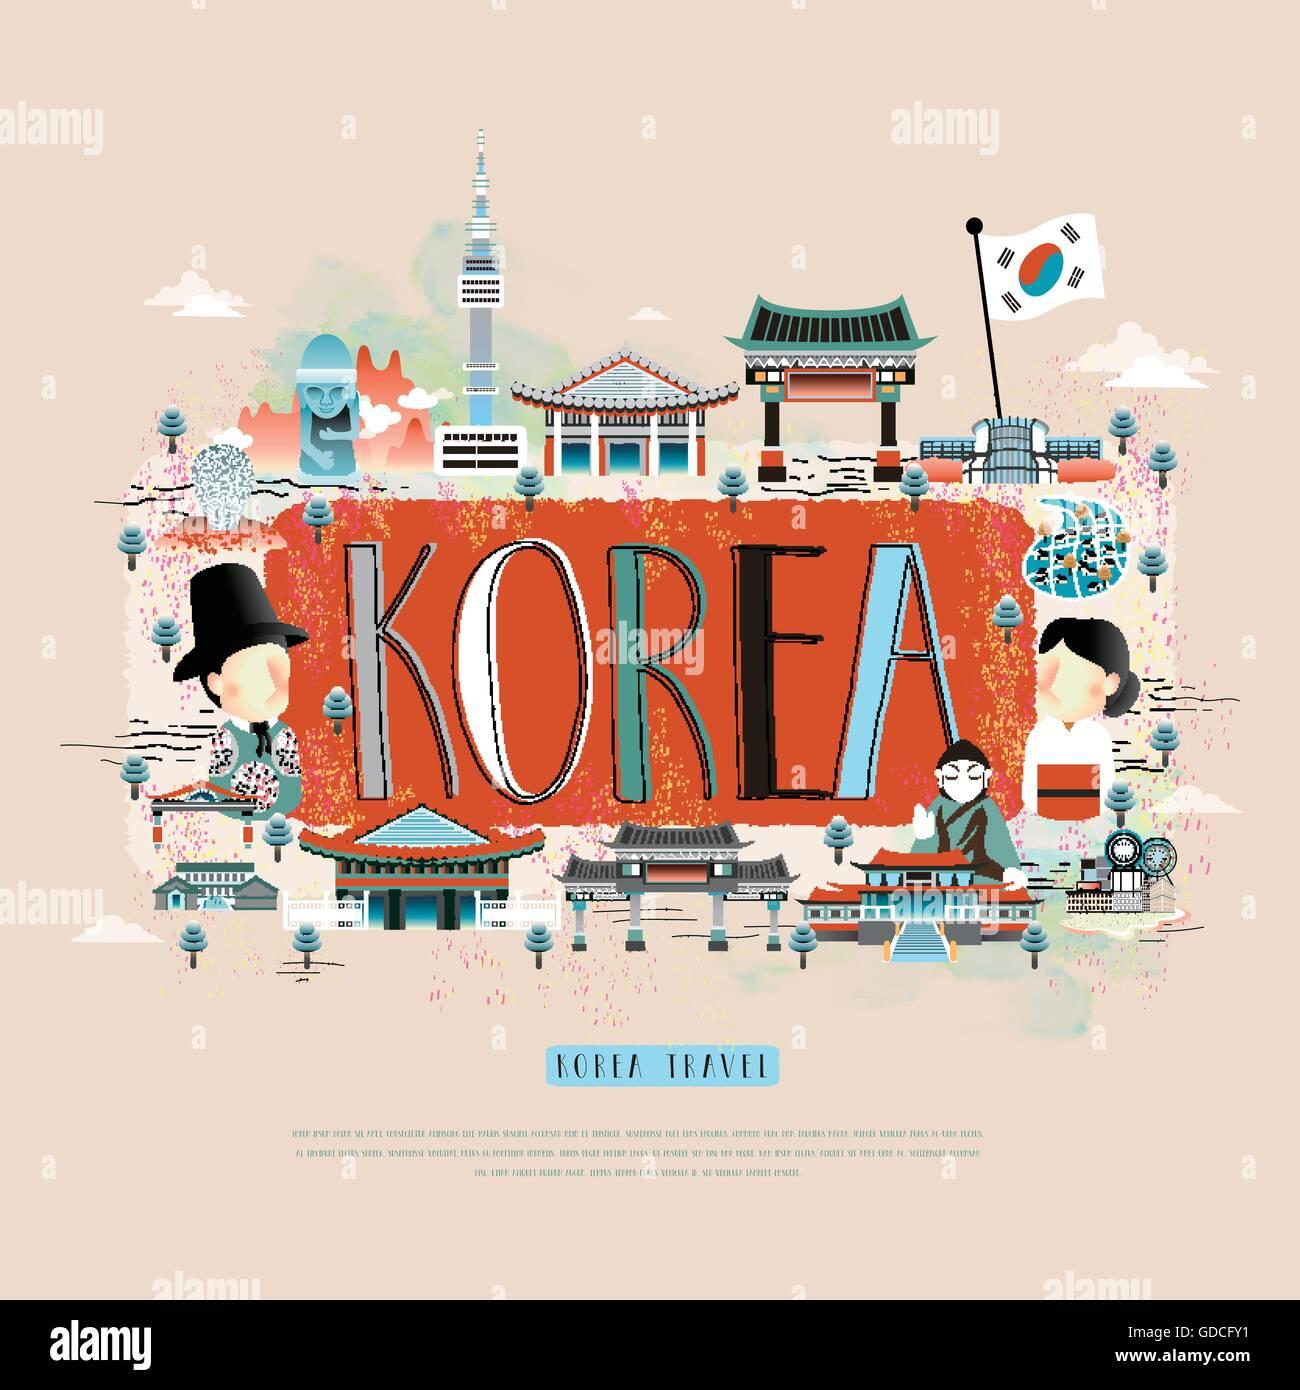 Korean poster design - Stock Vector Moder Korean Travel Poster Design With Attractions